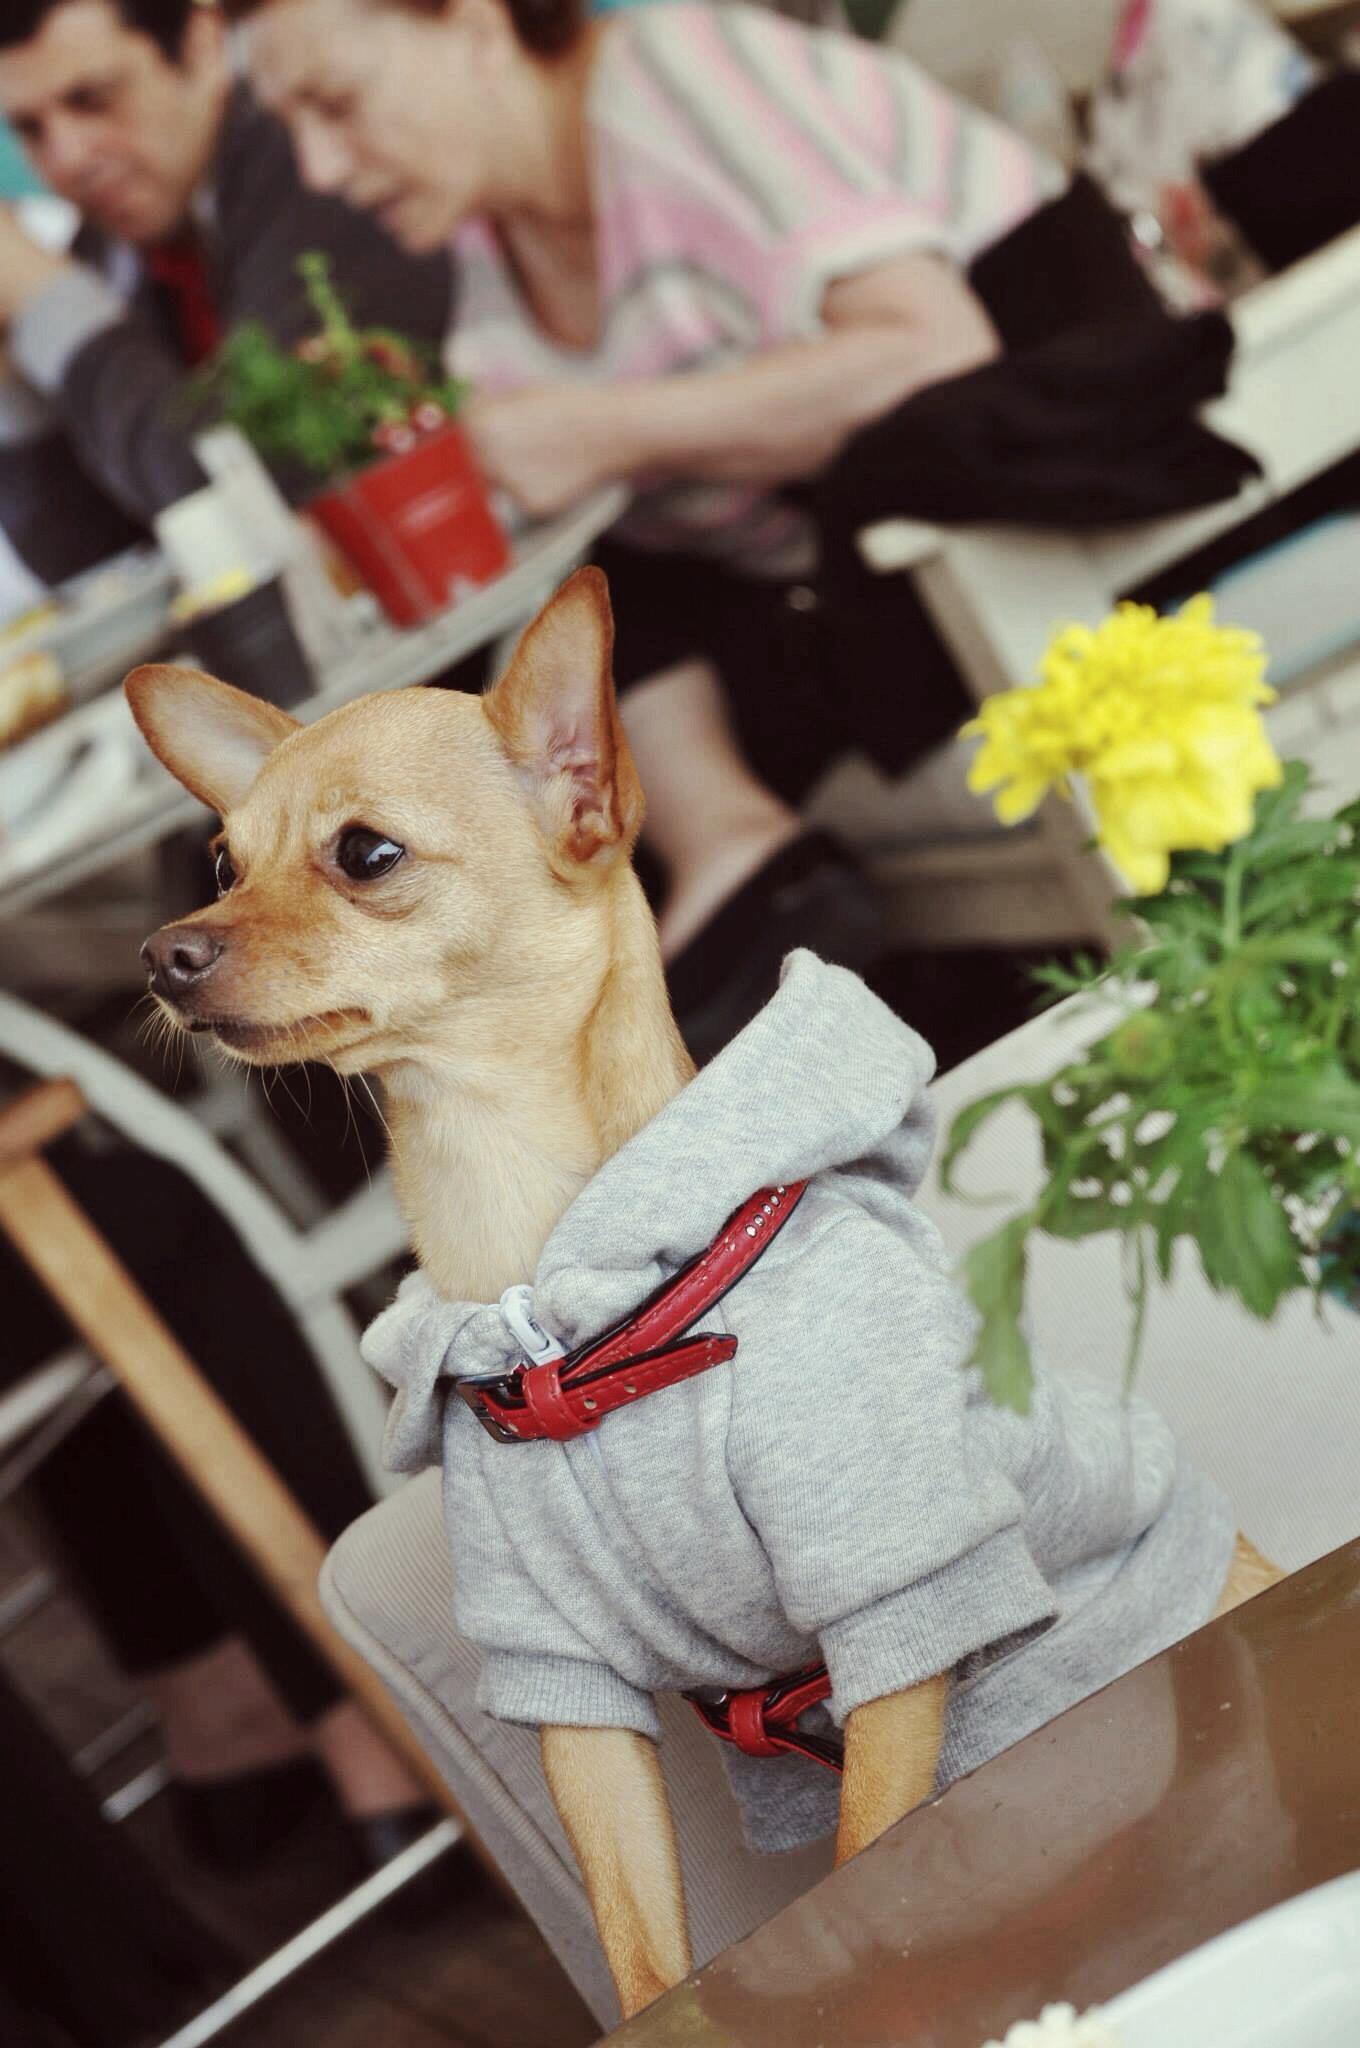 kopek girebilir, assk kahve-burcu-ozcan-assk-kahve-asskcafe-kurucesme-wuufbox-zarabasic-chihuahua_mira (5)